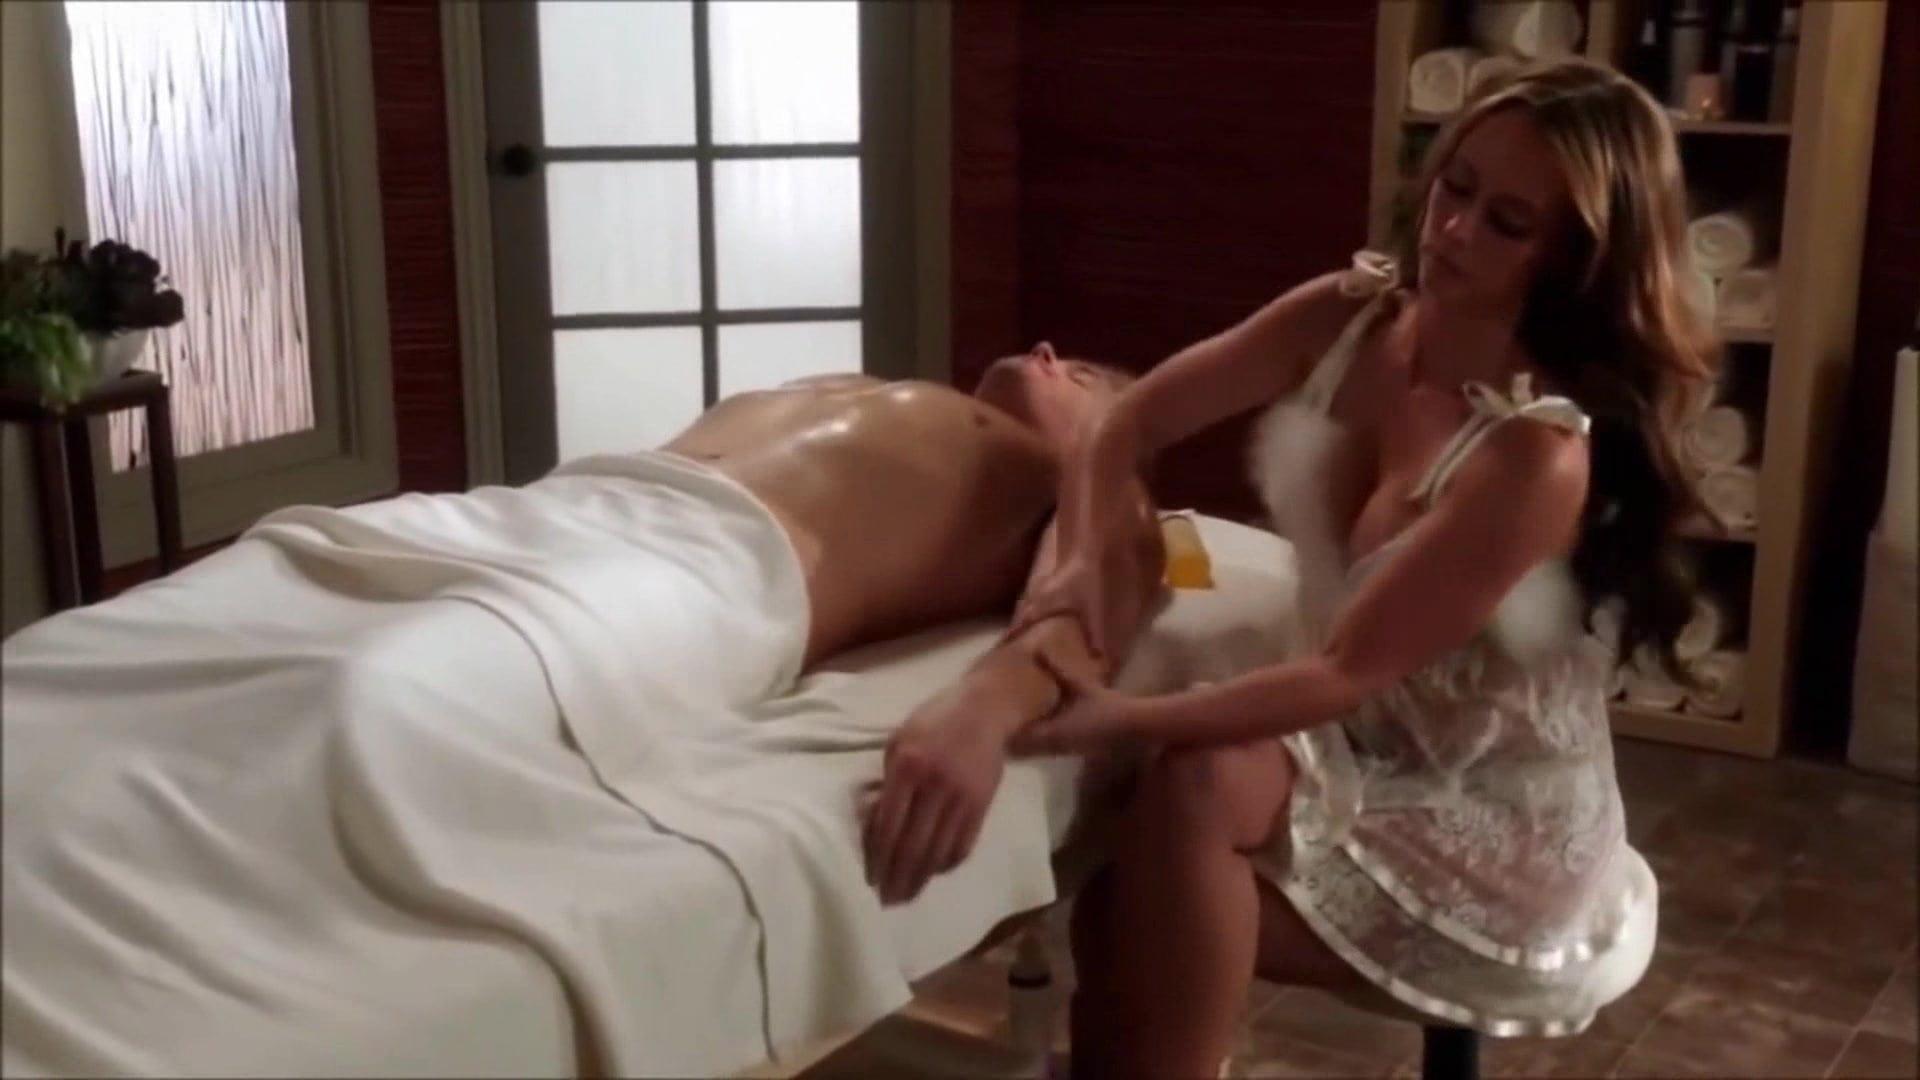 jennifer-love-hewitt-sex-video-tape-brutal-dildo-huge-video